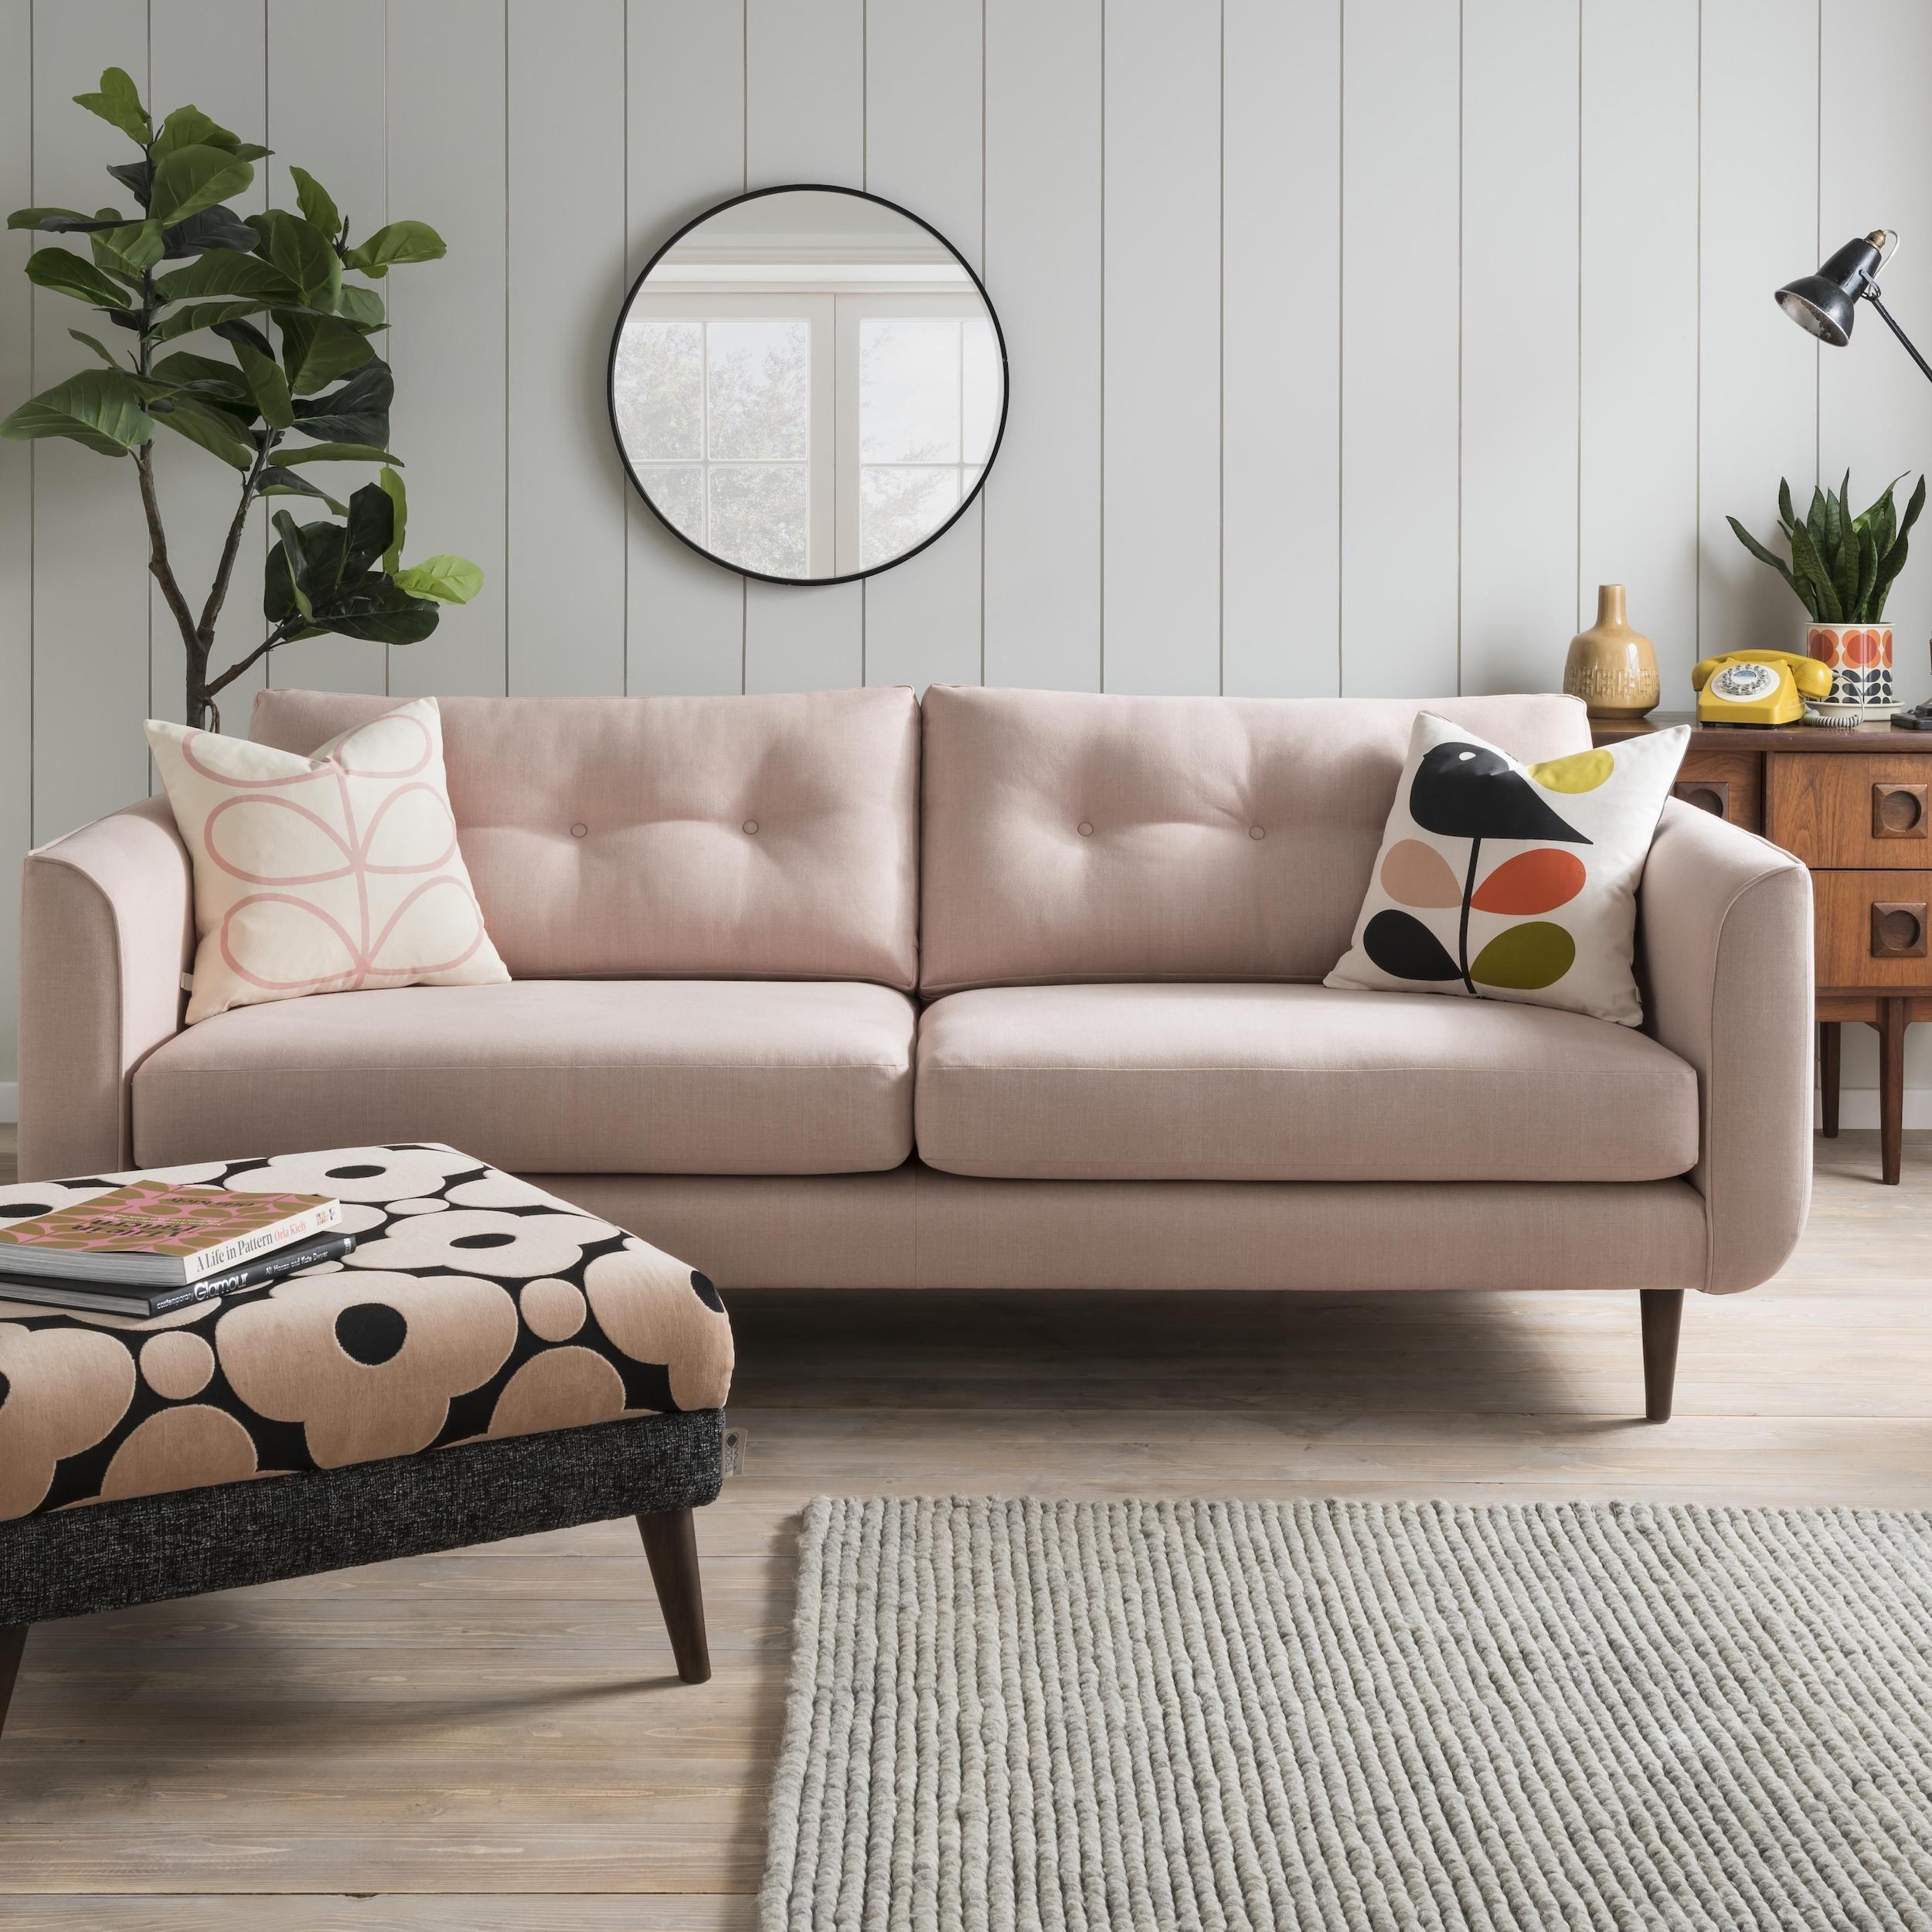 Buy Sofa Guide 5 Tips For Choosing A New Sofa